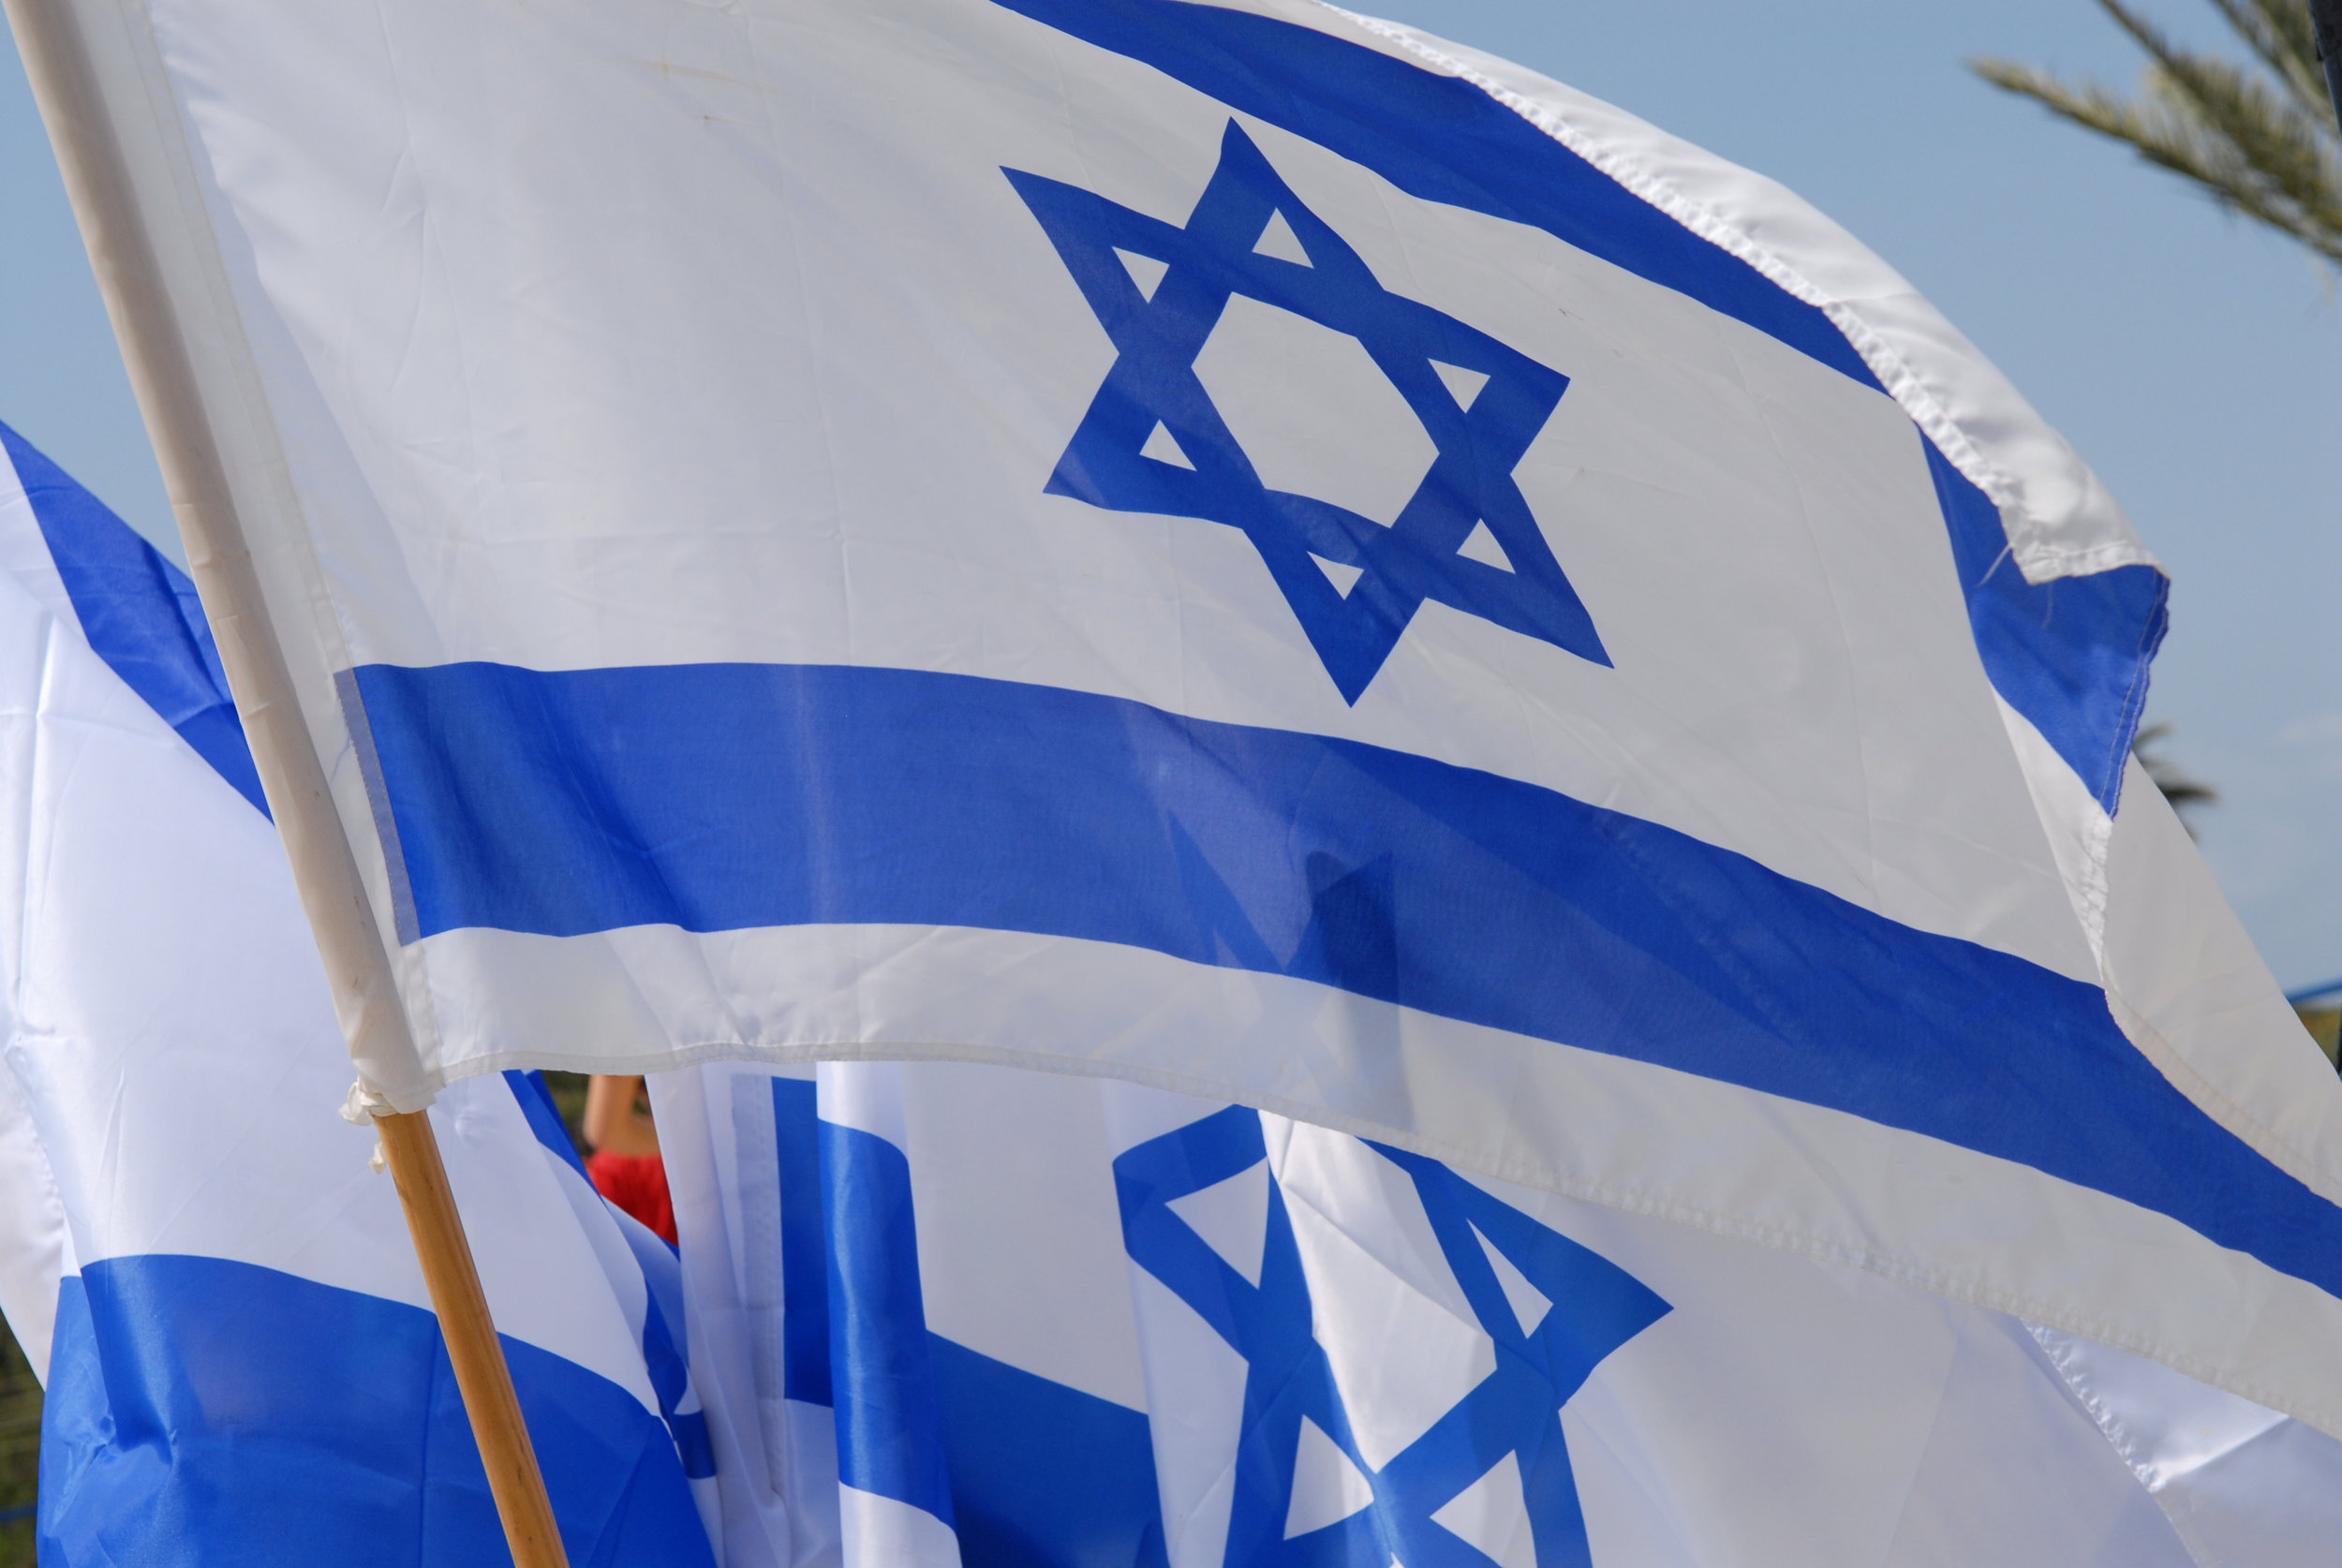 Group of Israeli Flags Flying.JPG